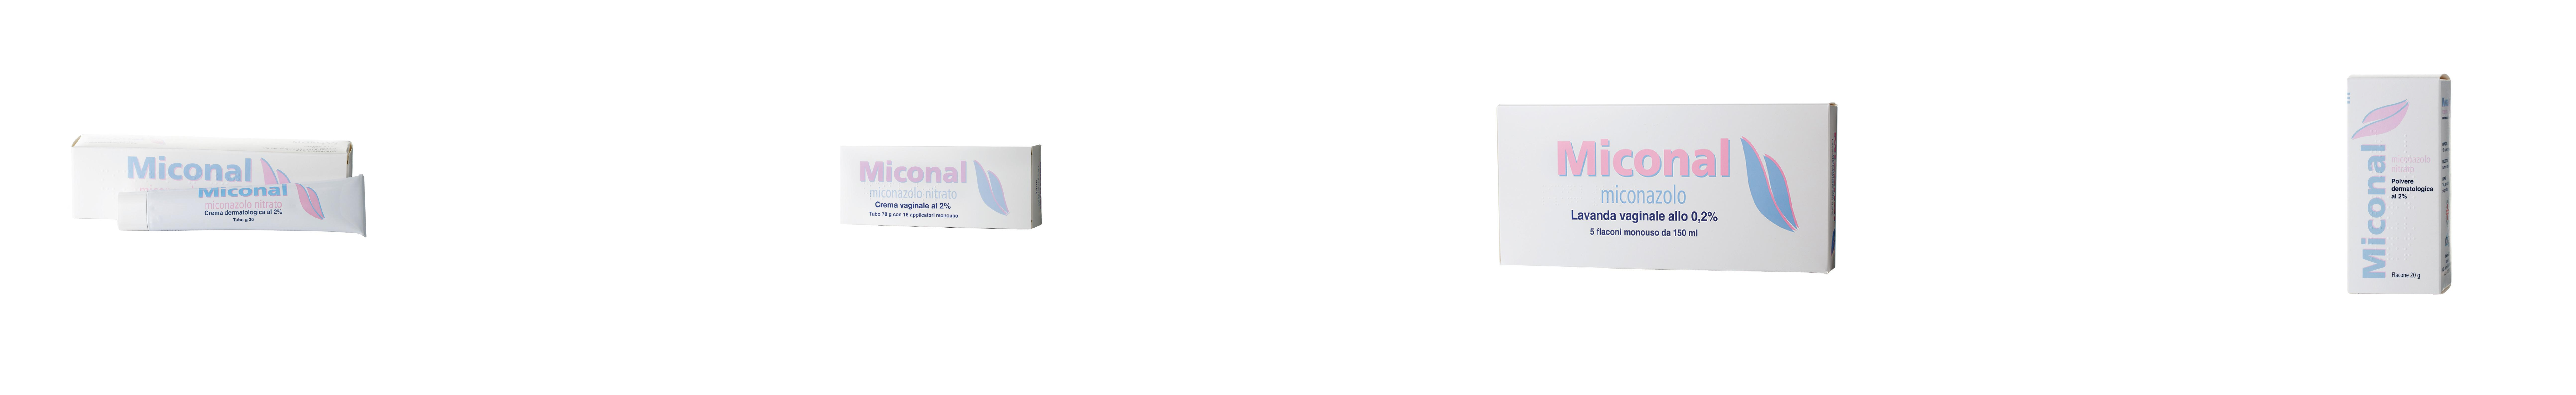 MICONAL*CREMA DERM 30G 2% - SUBITOINFARMA